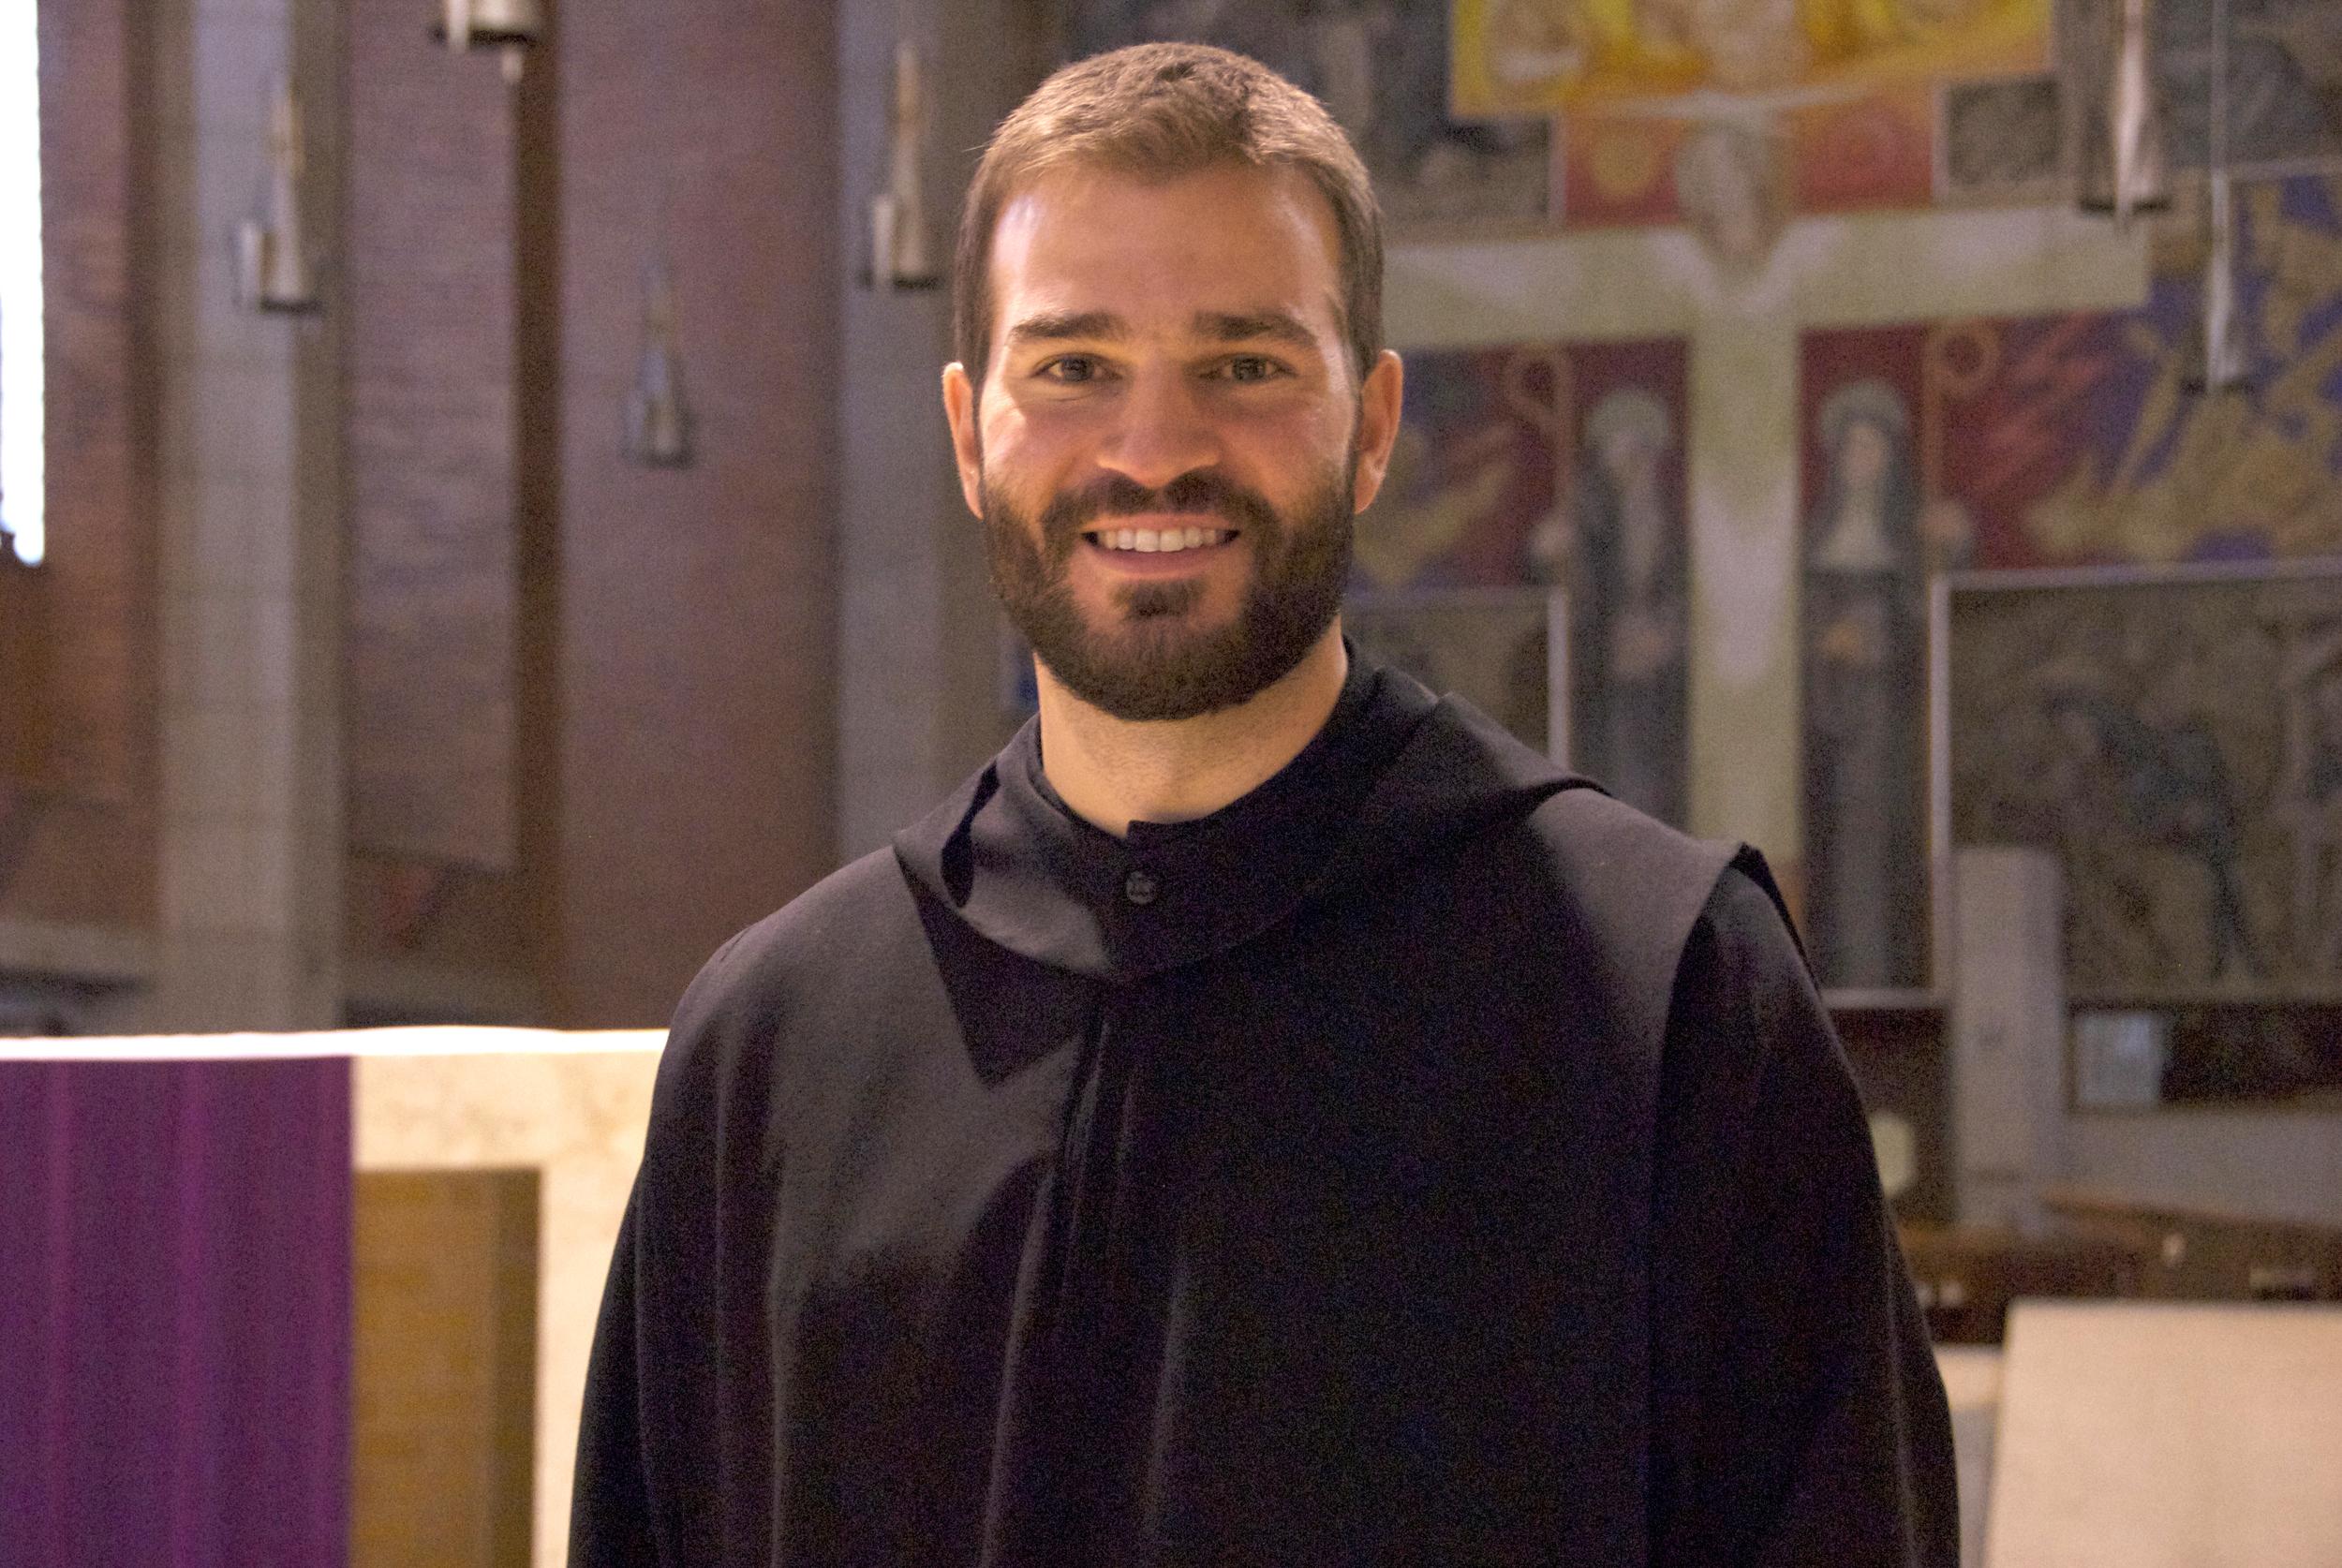 Fr. Simon Baker - Formation Director, Benedictine College Chaplain